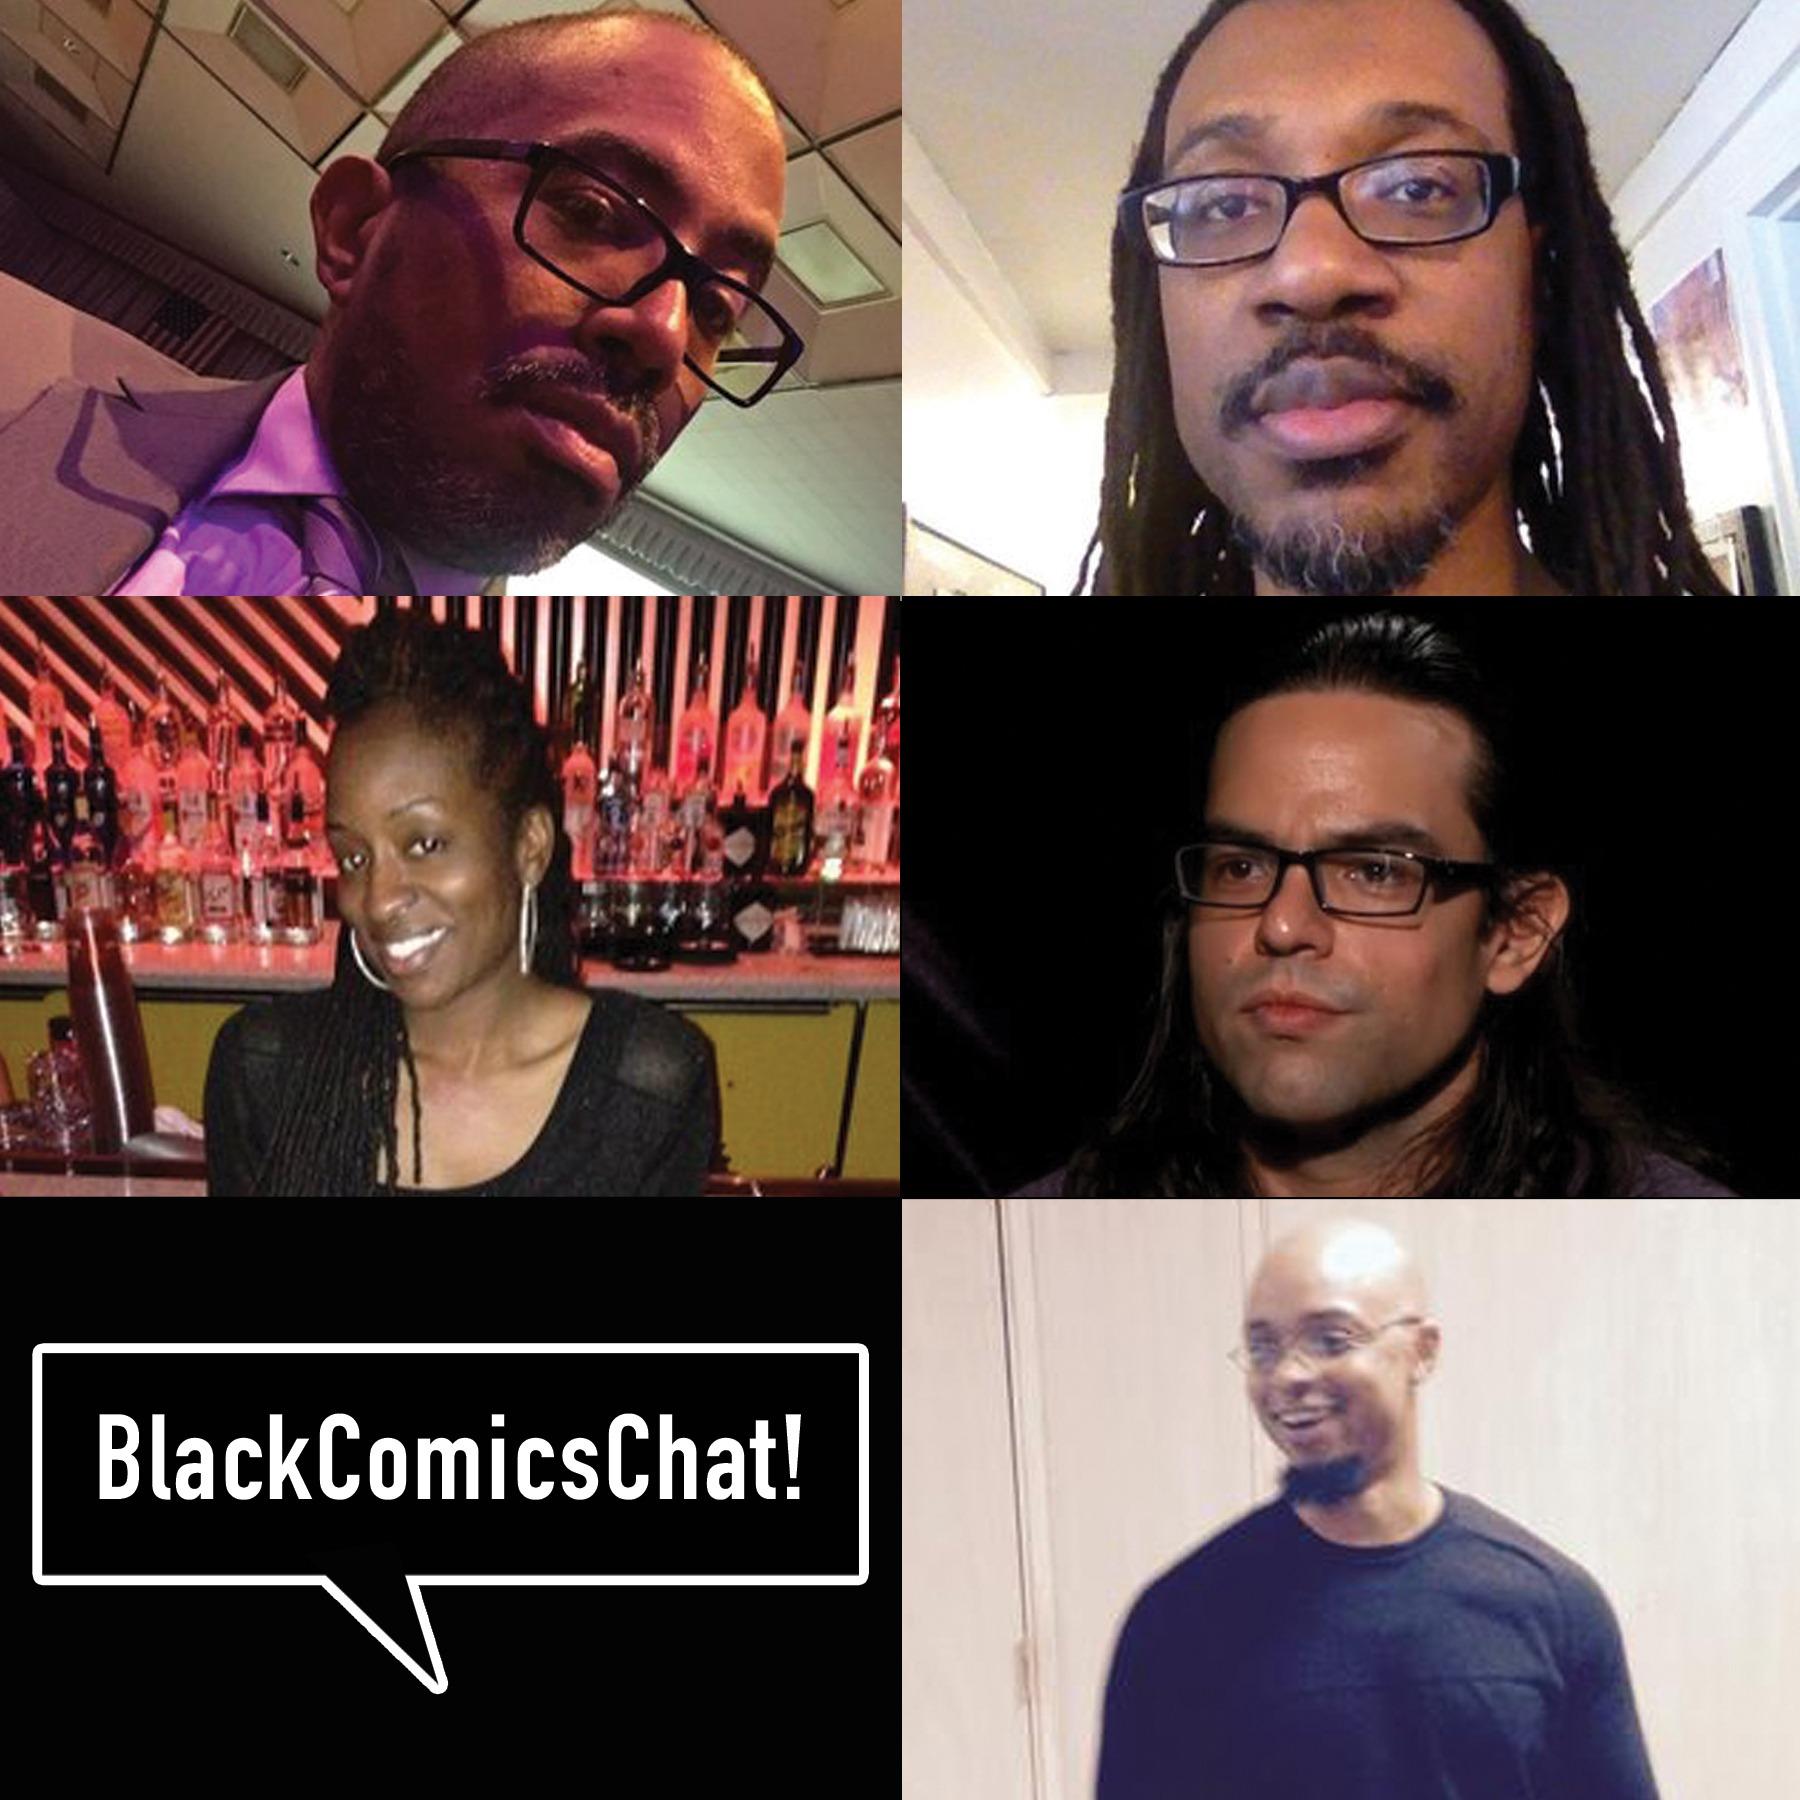 @blackcomicschat Profile Image | Linktree